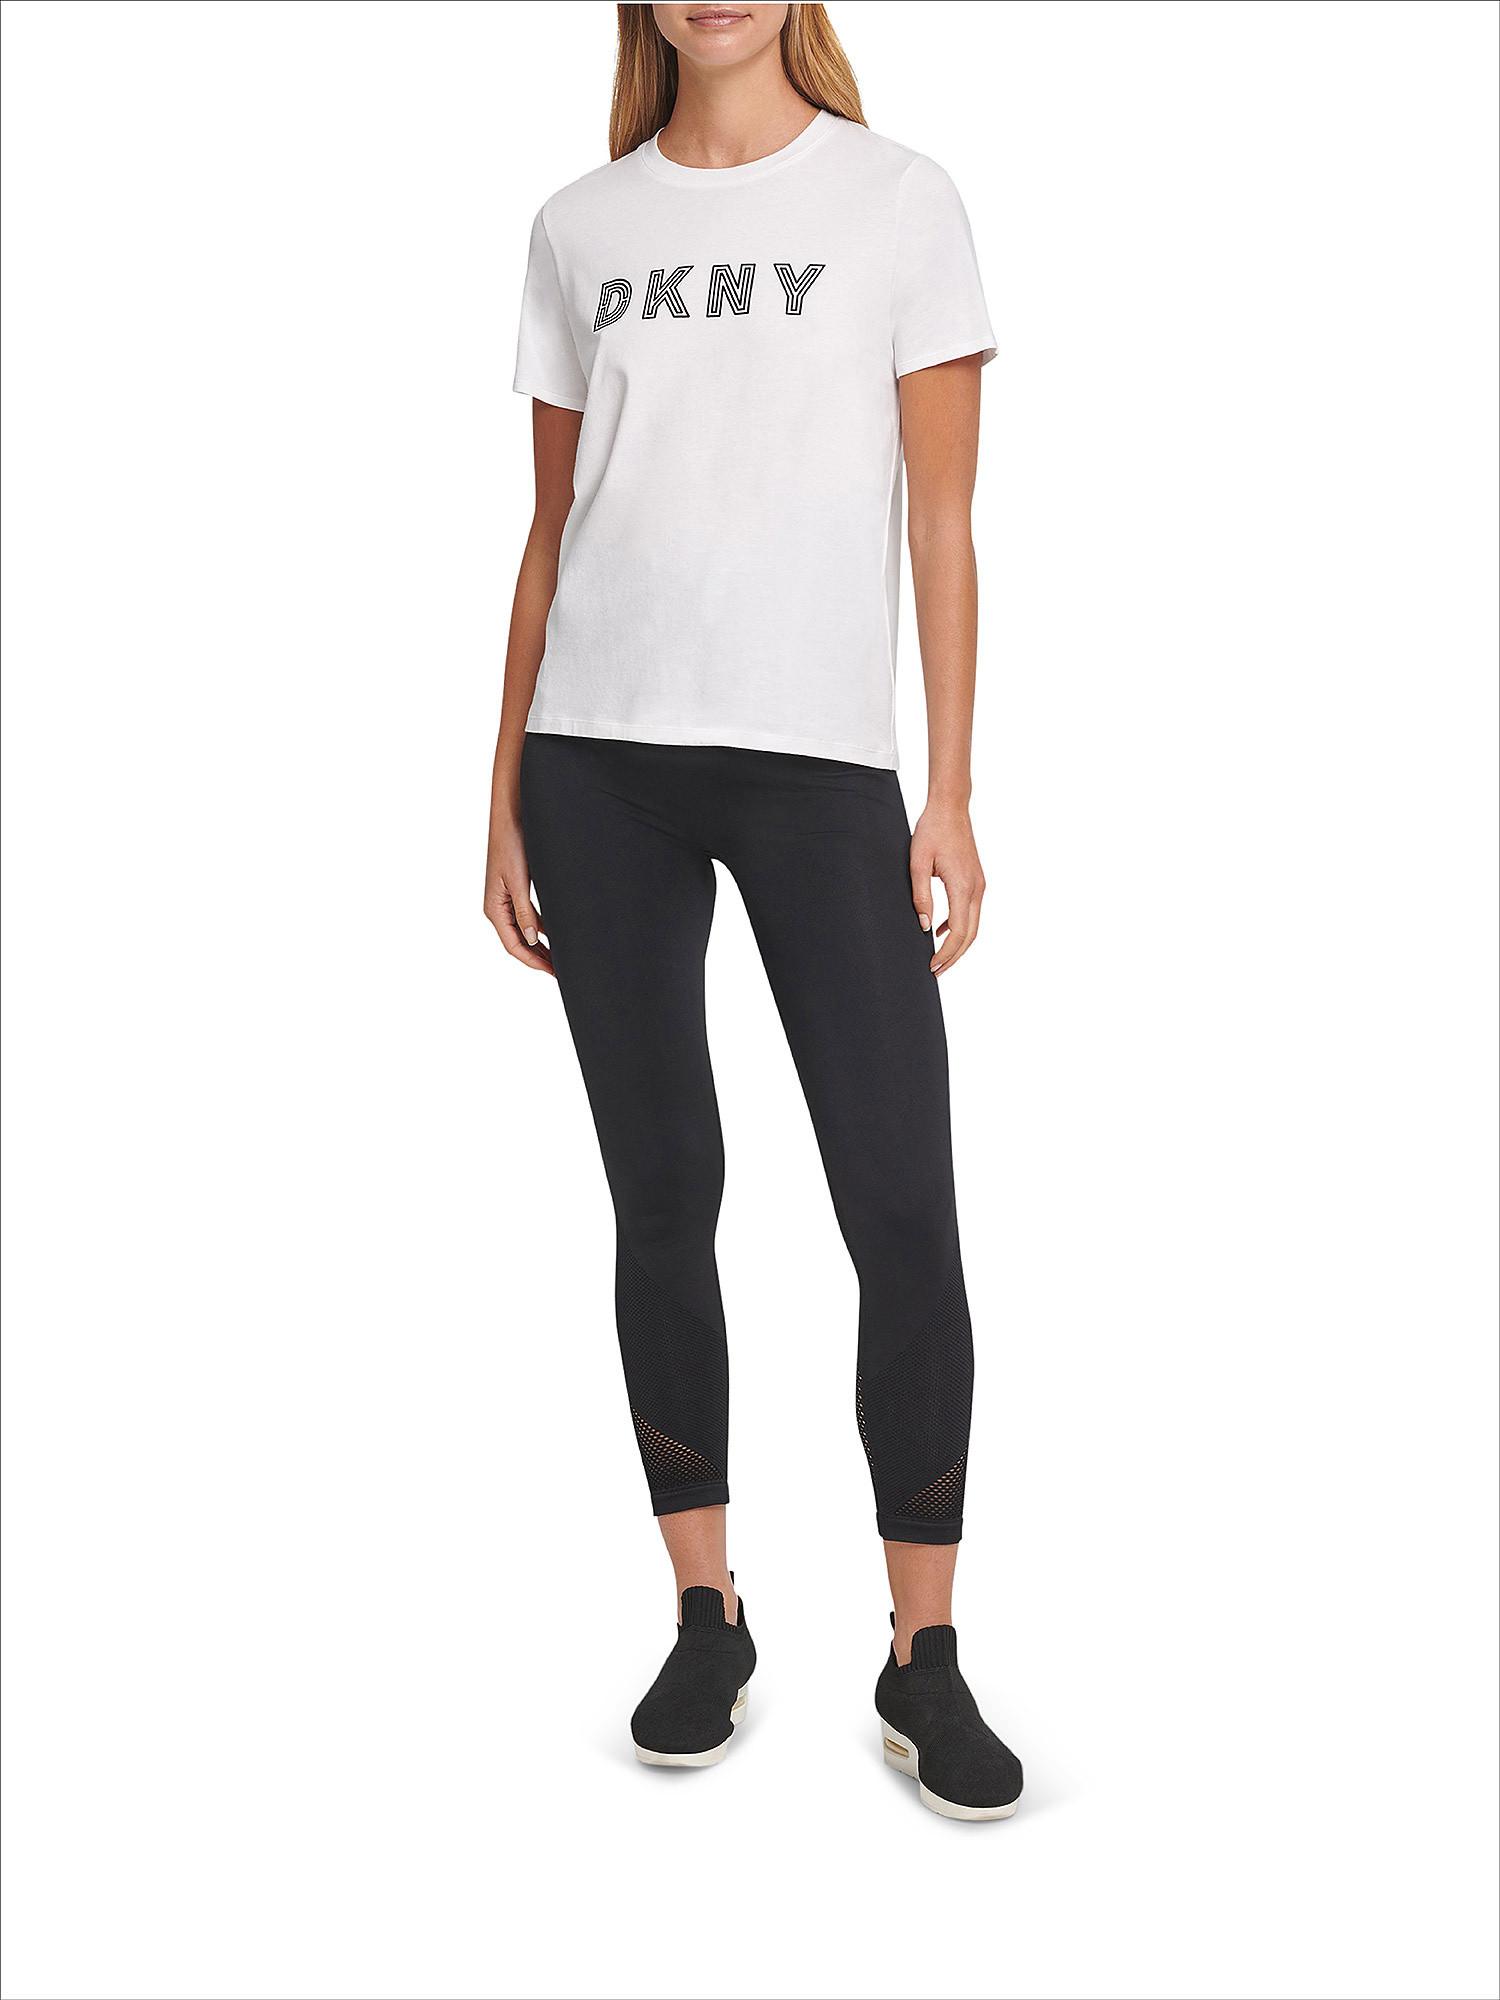 T-shirt track logo a maniche corte, Bianco, large image number 2